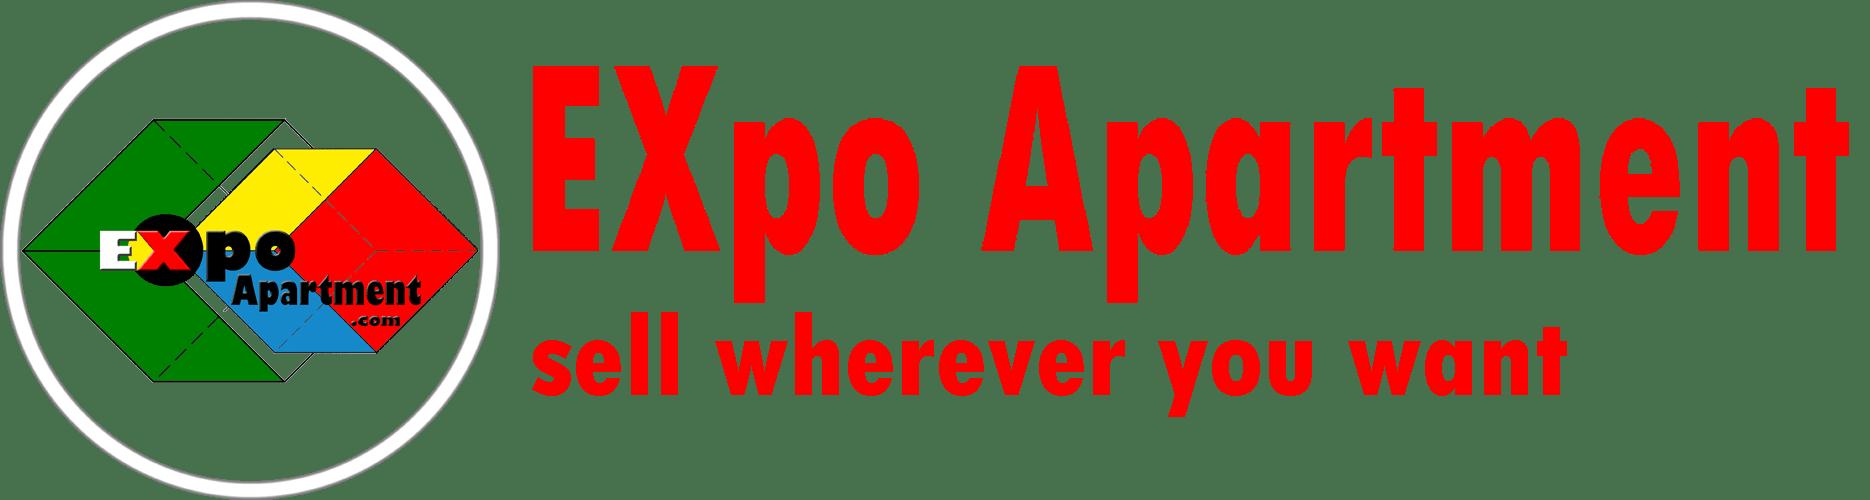 EXpo Apartment Online & Digital Marketing Property | https://EXpoApartment.com